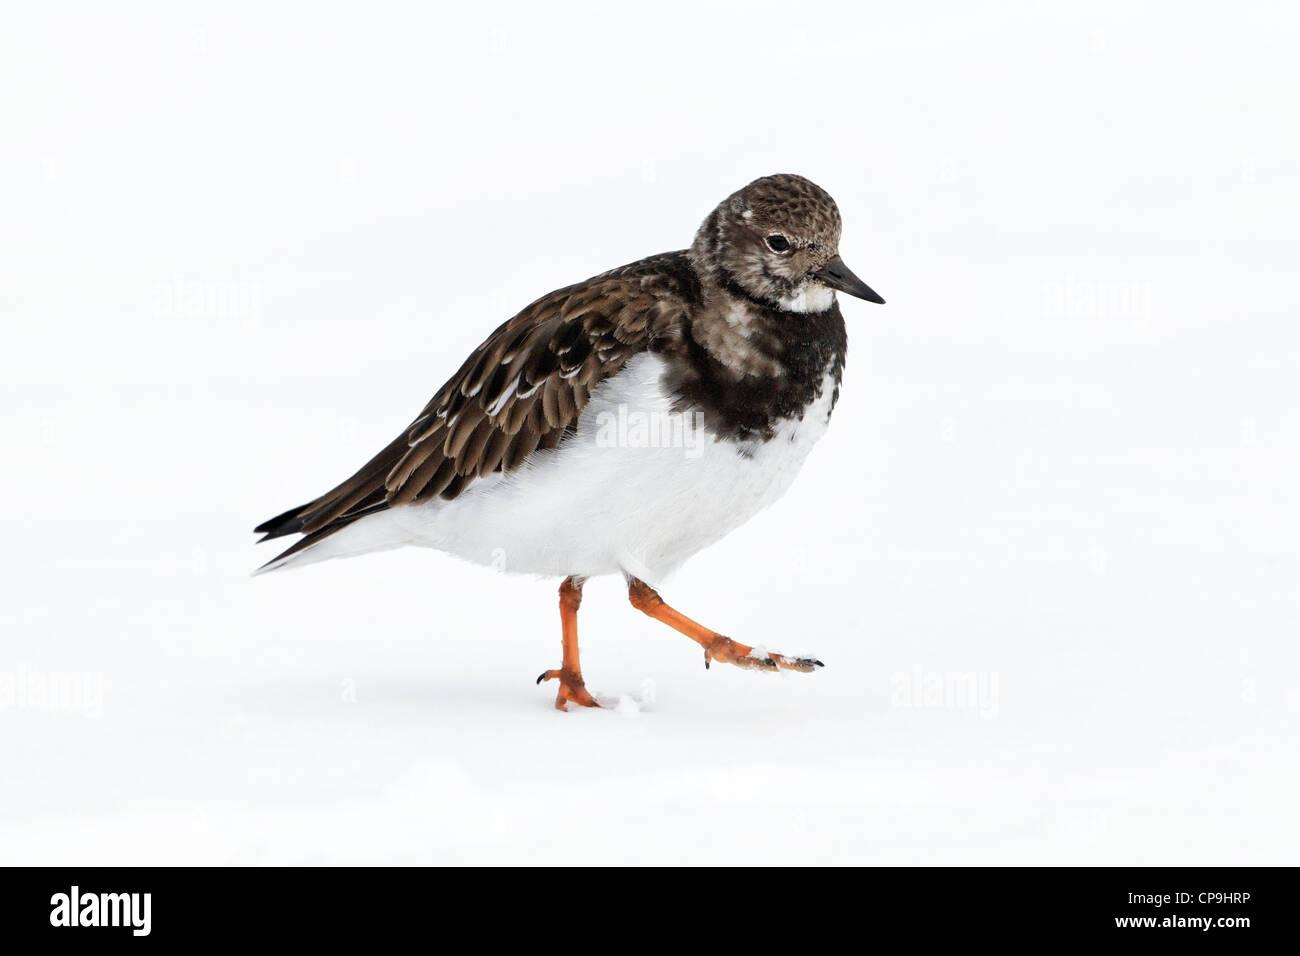 Turnstone, Ruddy Turnstone, Arenaria interpres, a single winter plumage bird walking on snow, Norfolk, February - Stock Image